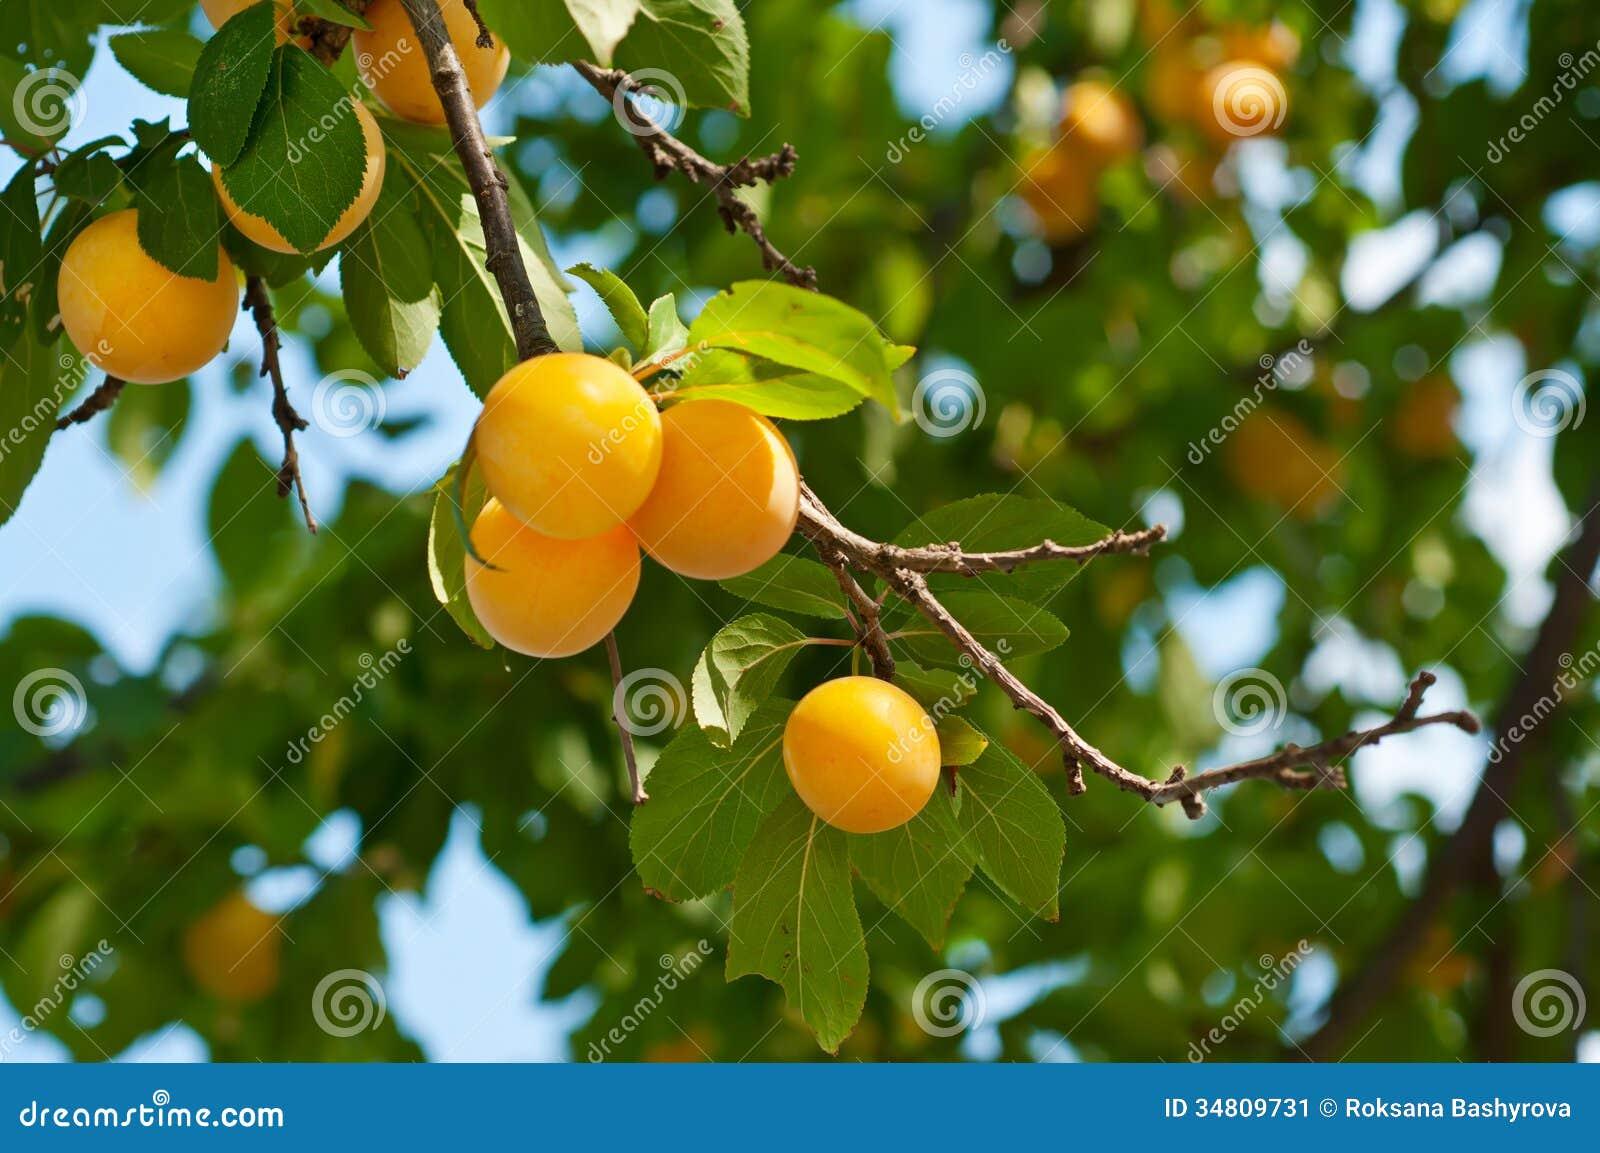 arbre de cerise prune avec des fruits image stock image 34809731. Black Bedroom Furniture Sets. Home Design Ideas